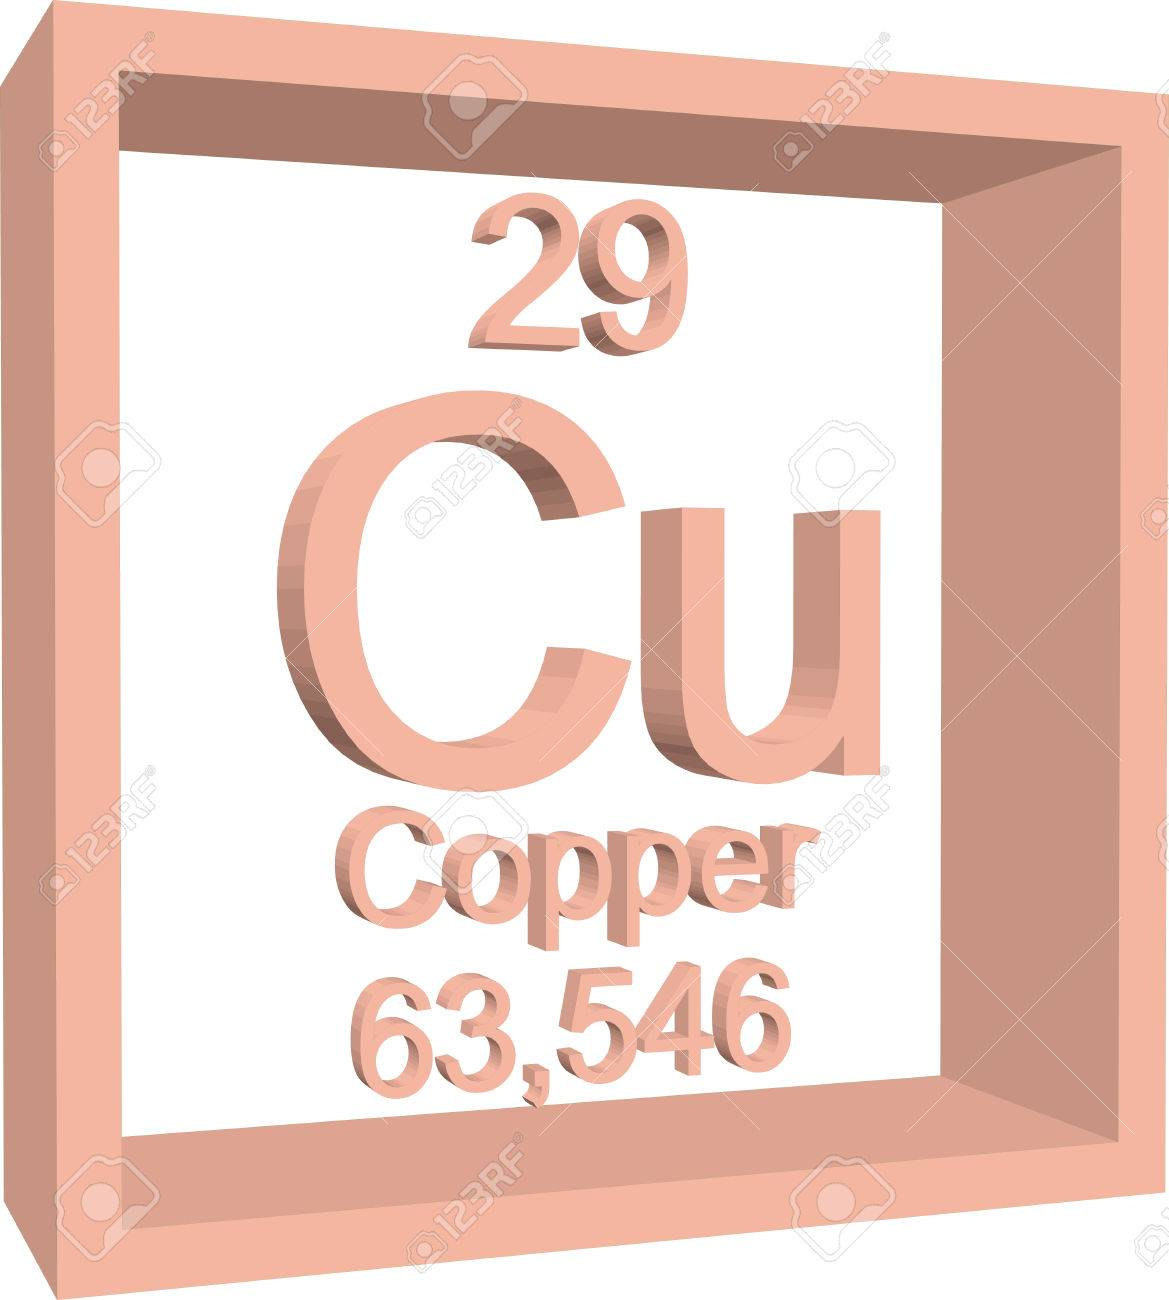 periodic table of elements copper stock vector 57970616 - Periodic Table Copper